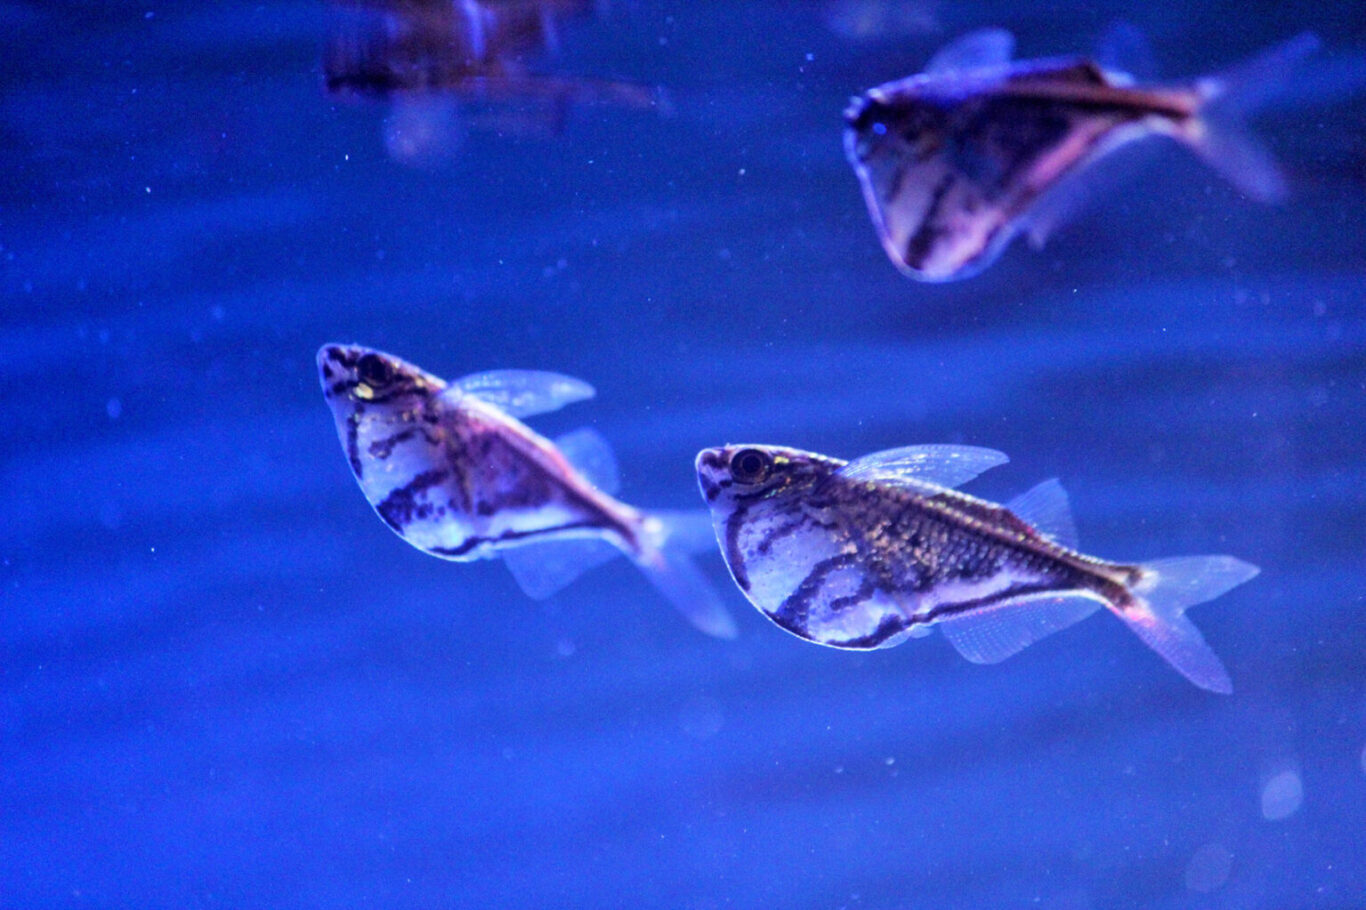 Flying Hatchet fish swim near the surface